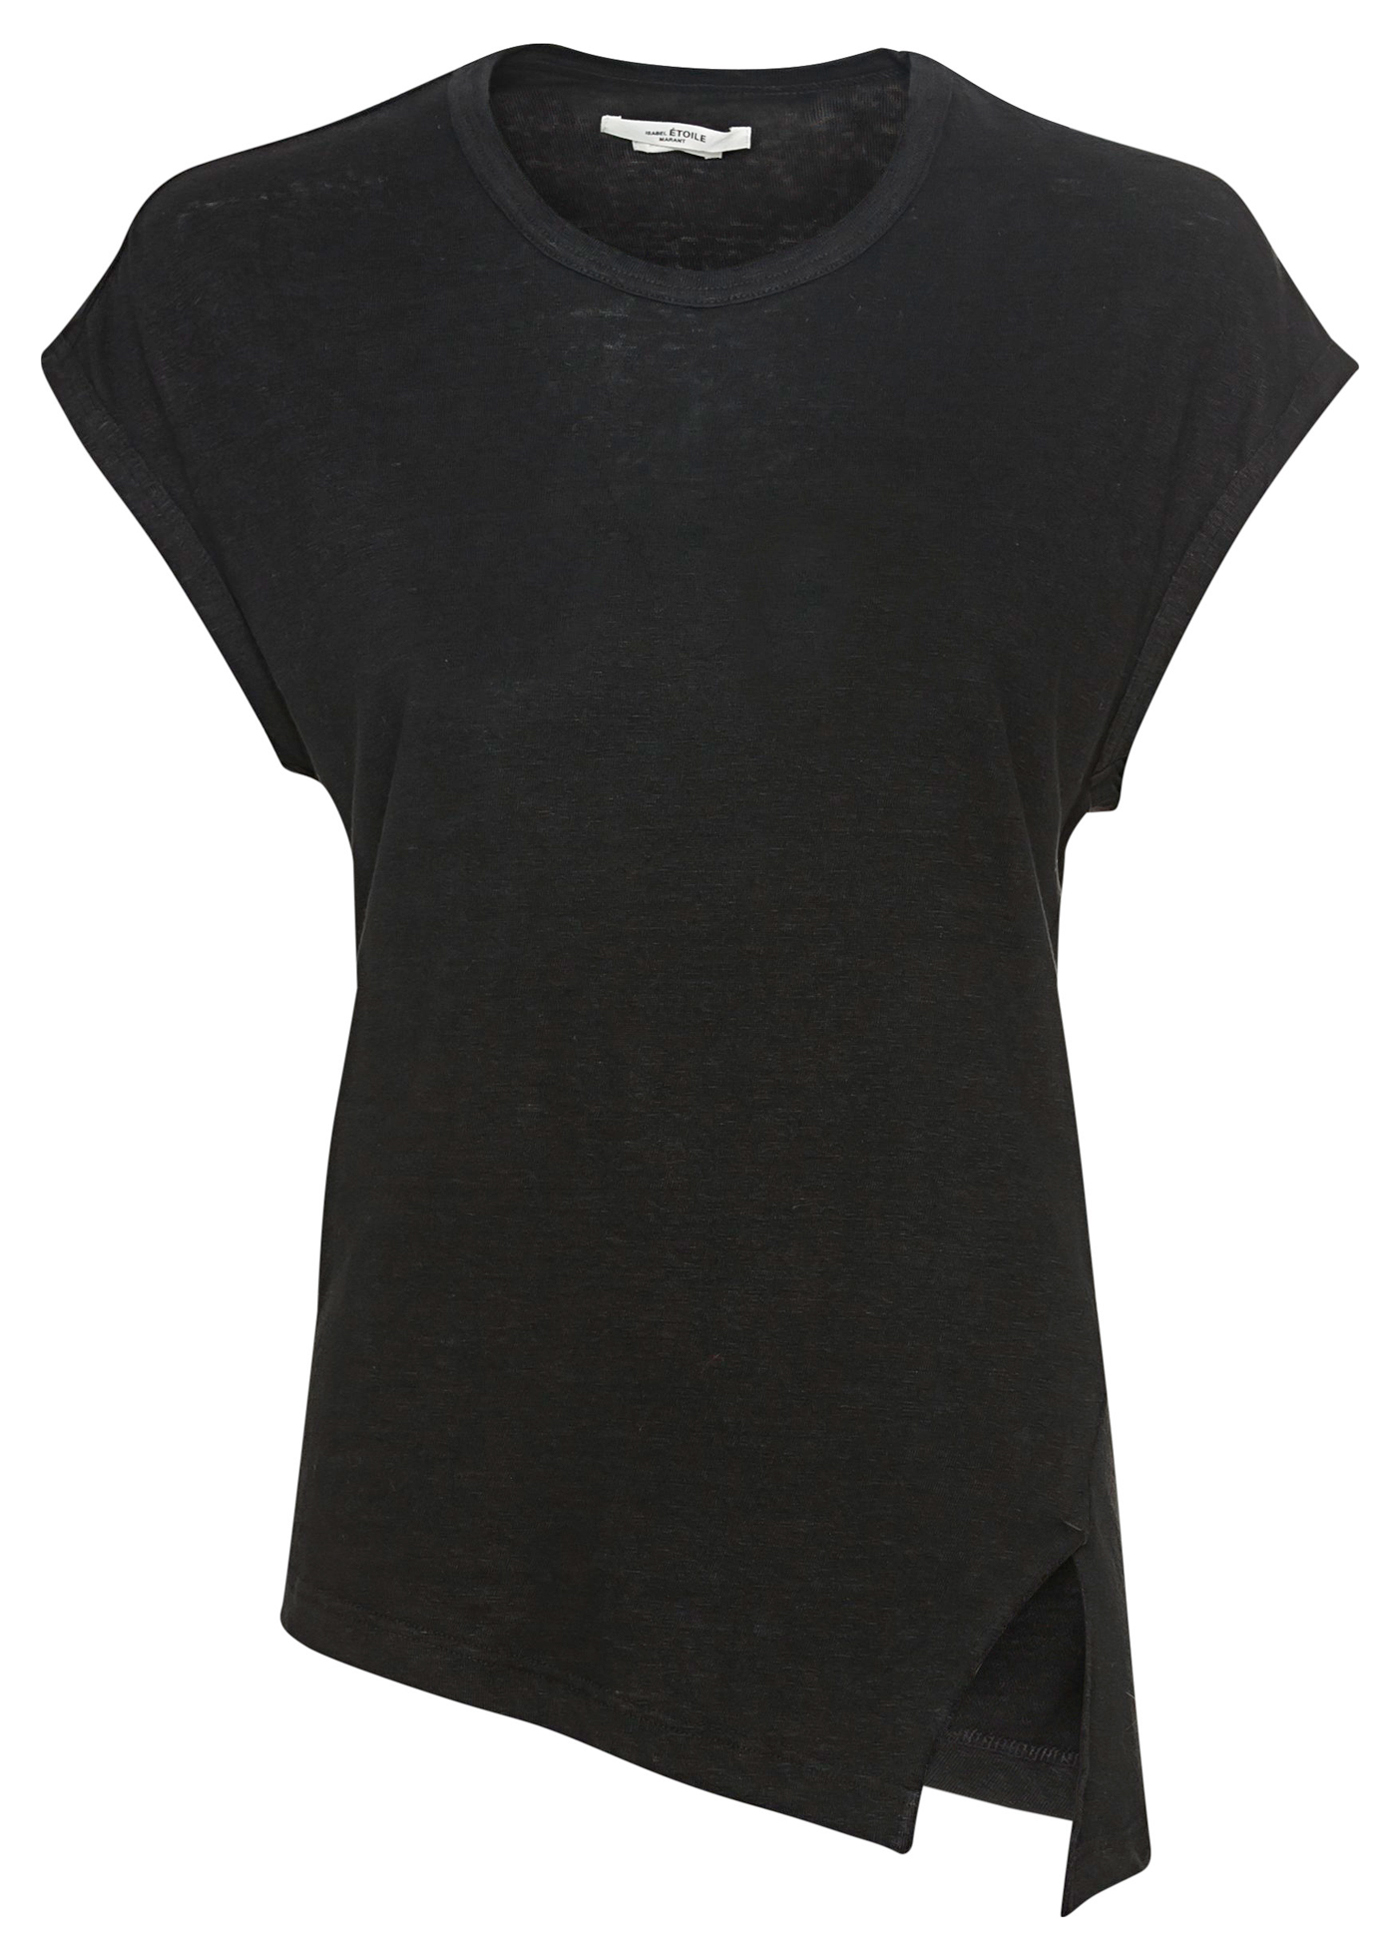 Tee shirt KELLA image number 0